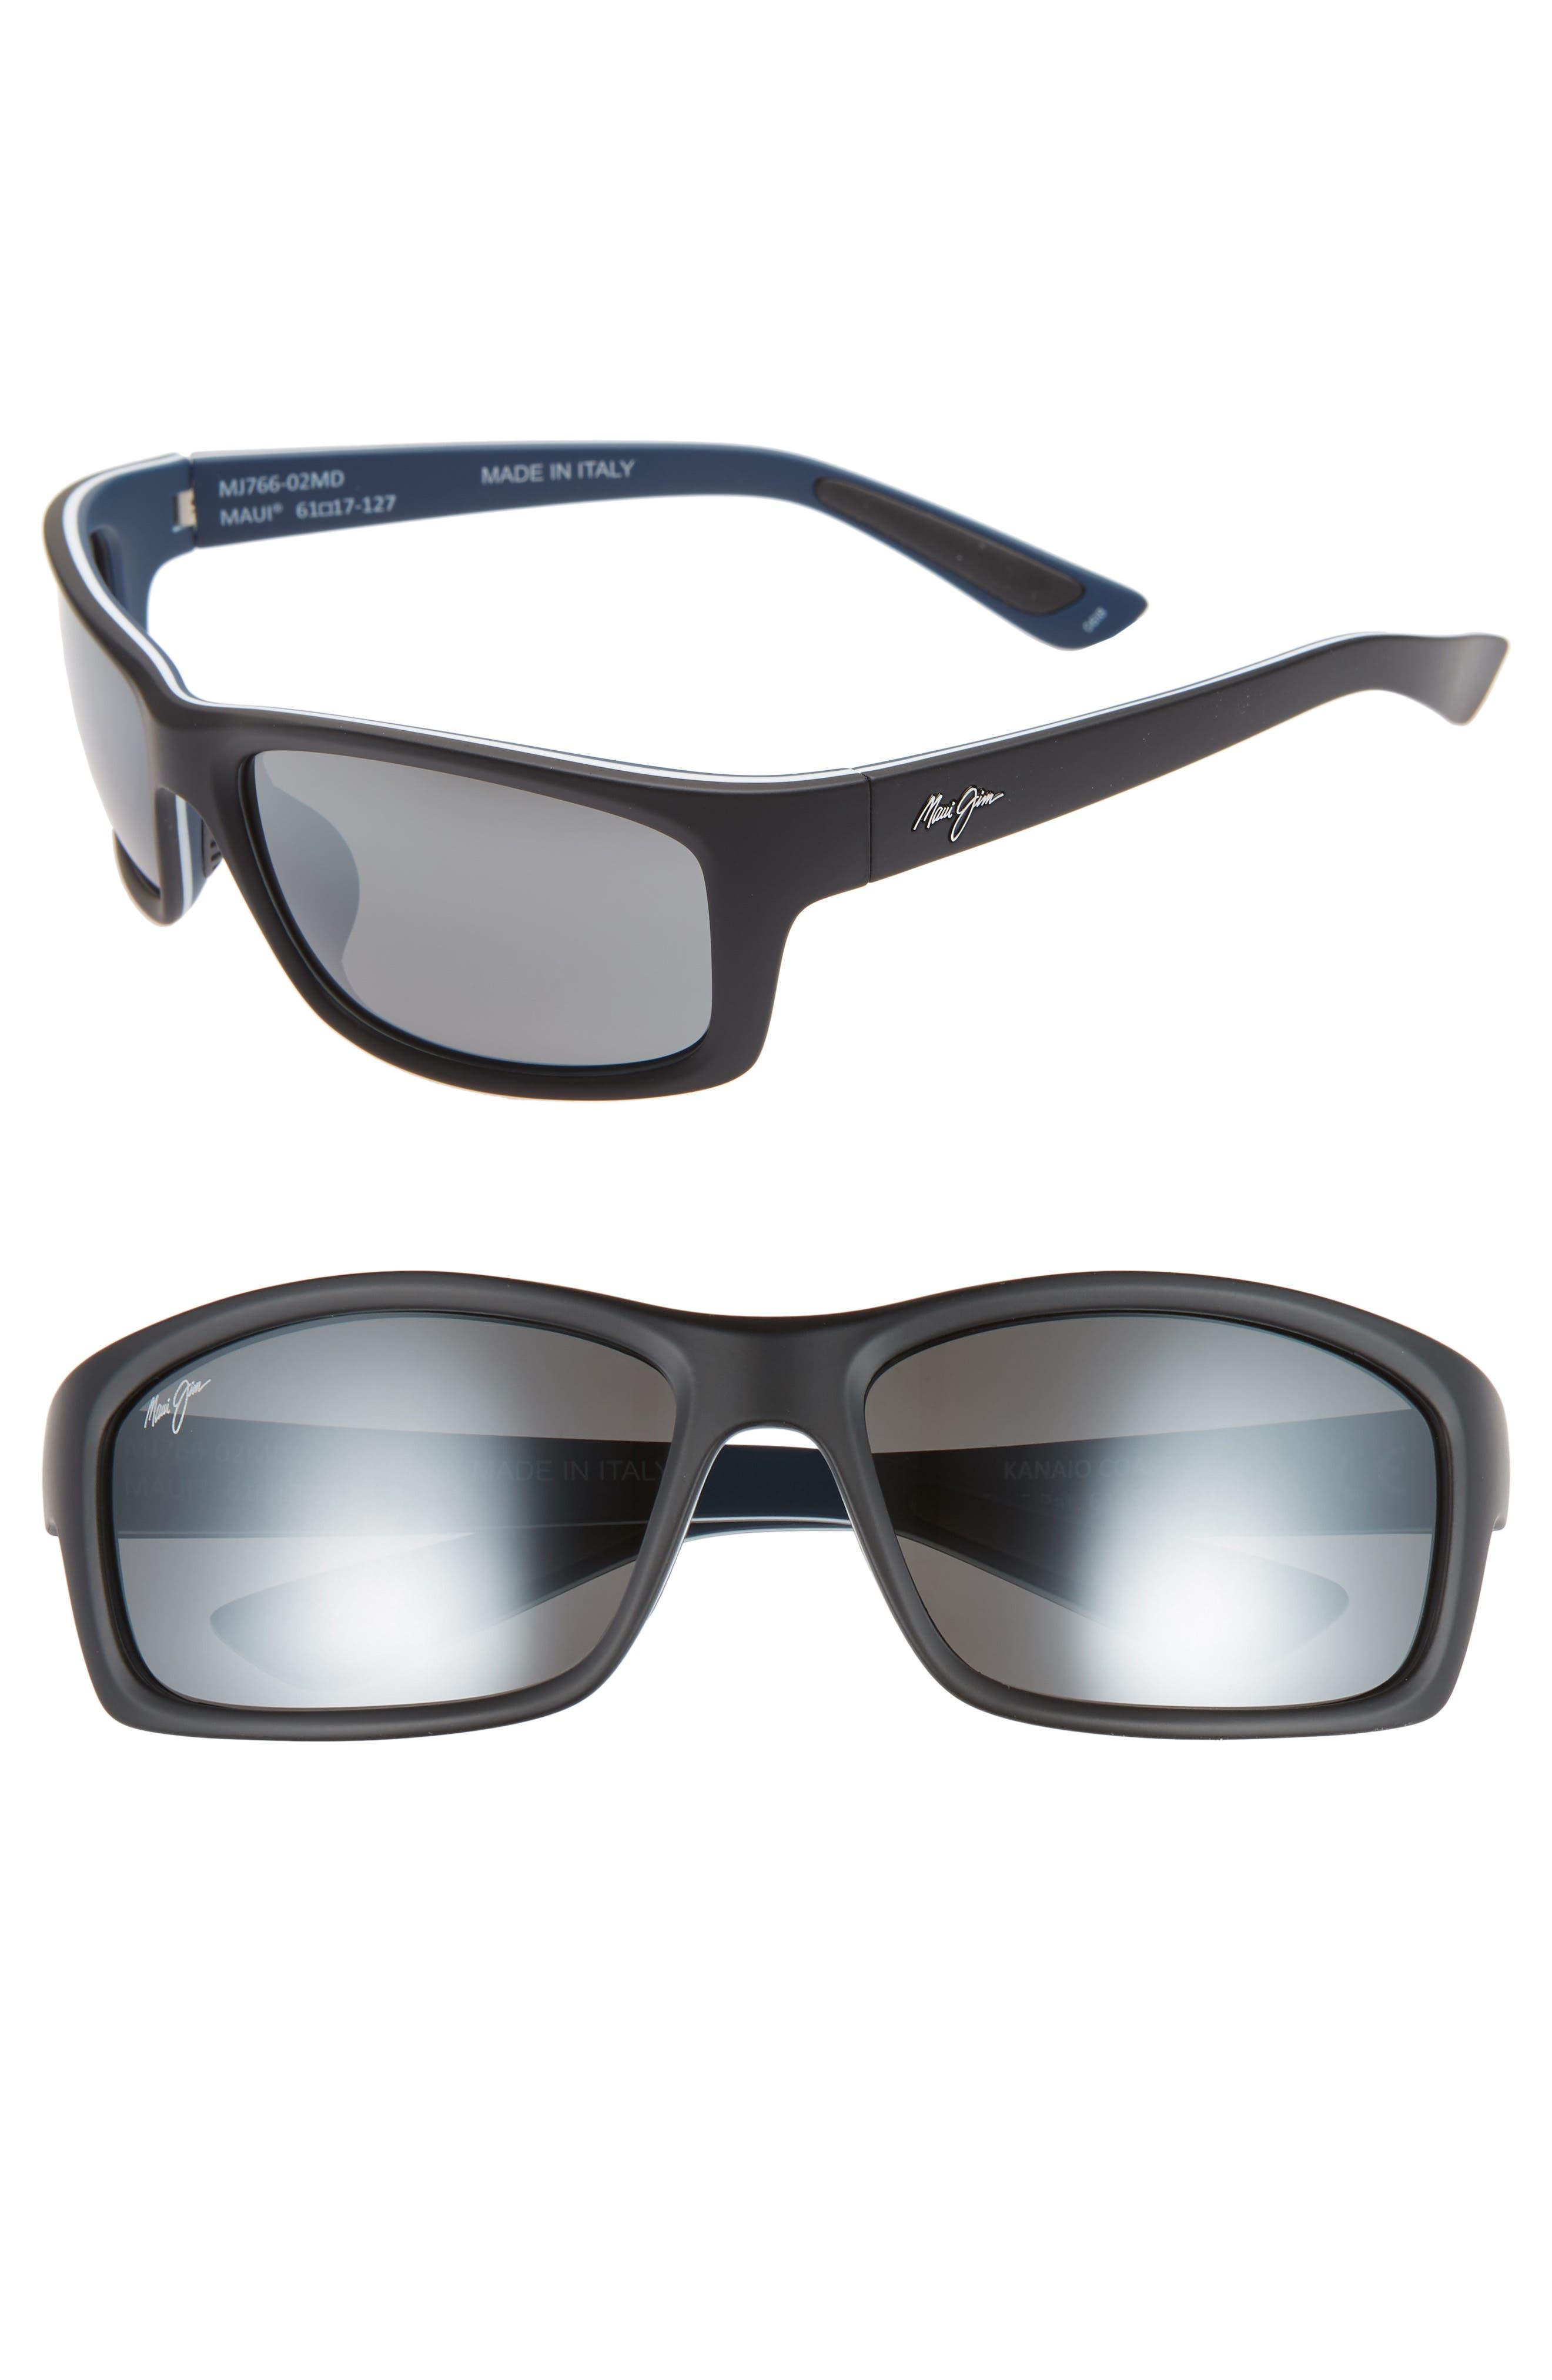 Maui Jim Kanaio Coast 61Mm Polarizedplus2 Sunglasses - Matte Black/white/blue